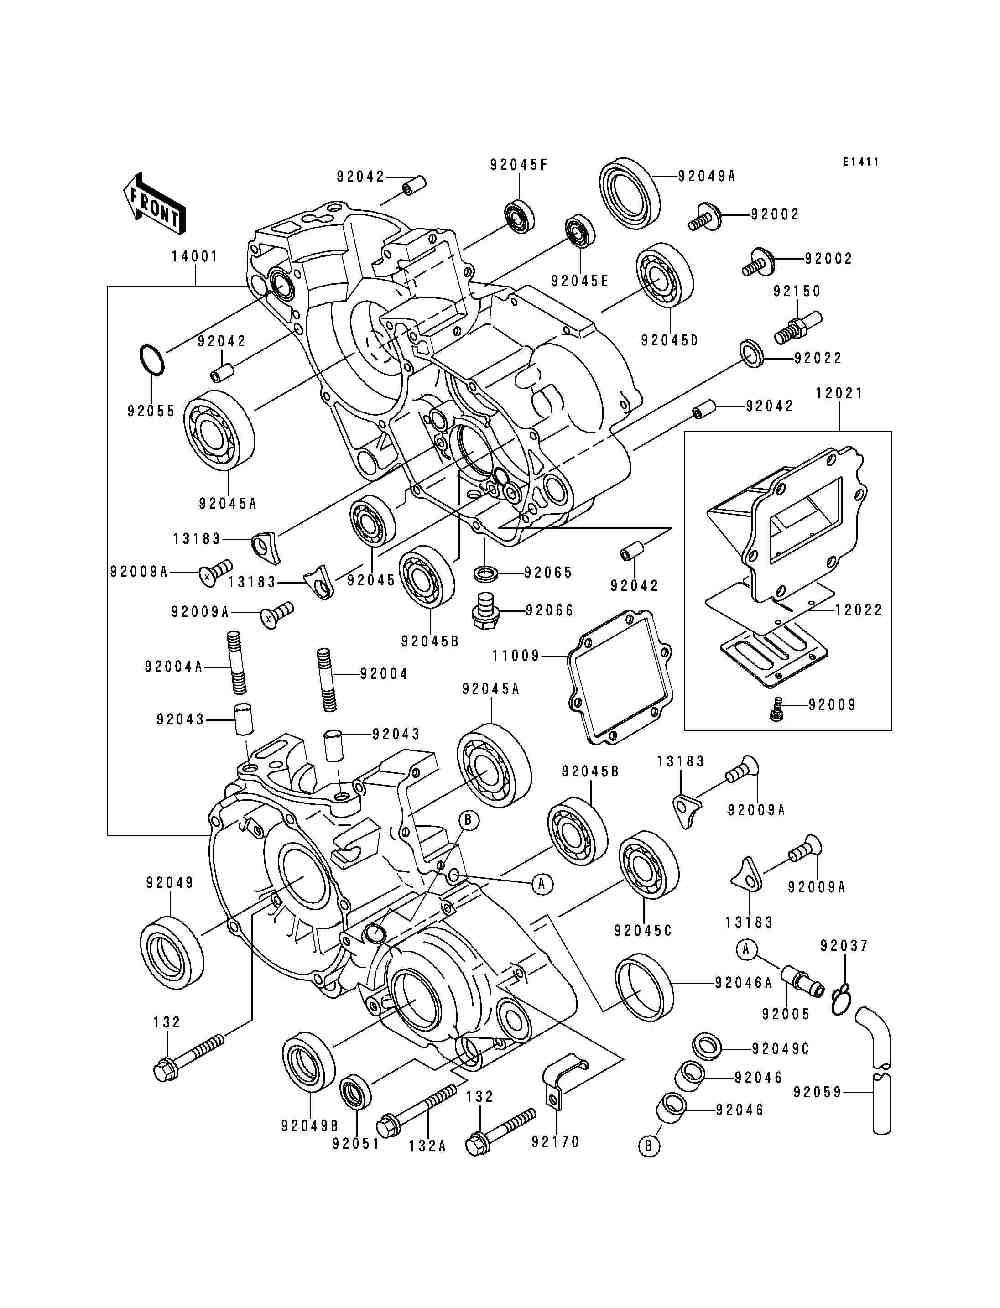 spaccato motore ktm 125 exc  u2013 idee per l u0026 39 immagine del